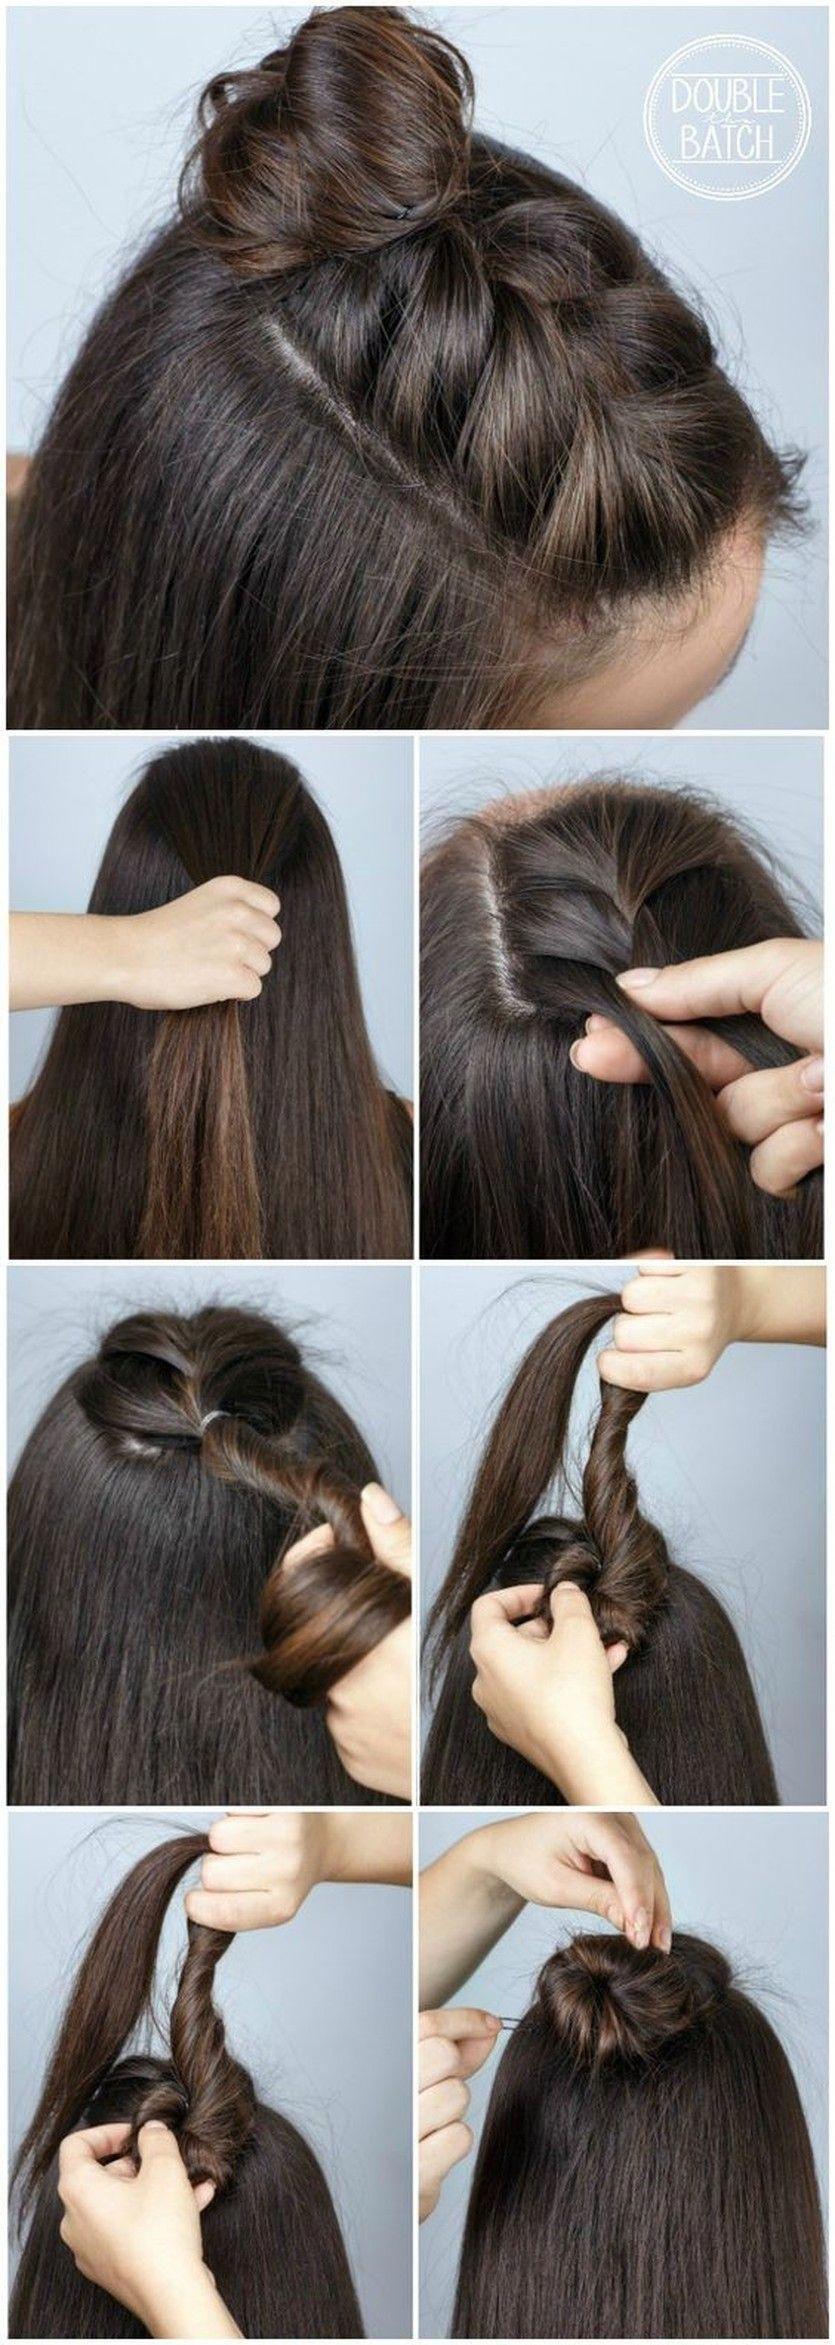 tutorial mohawk braid into top knot halfupdo for medium